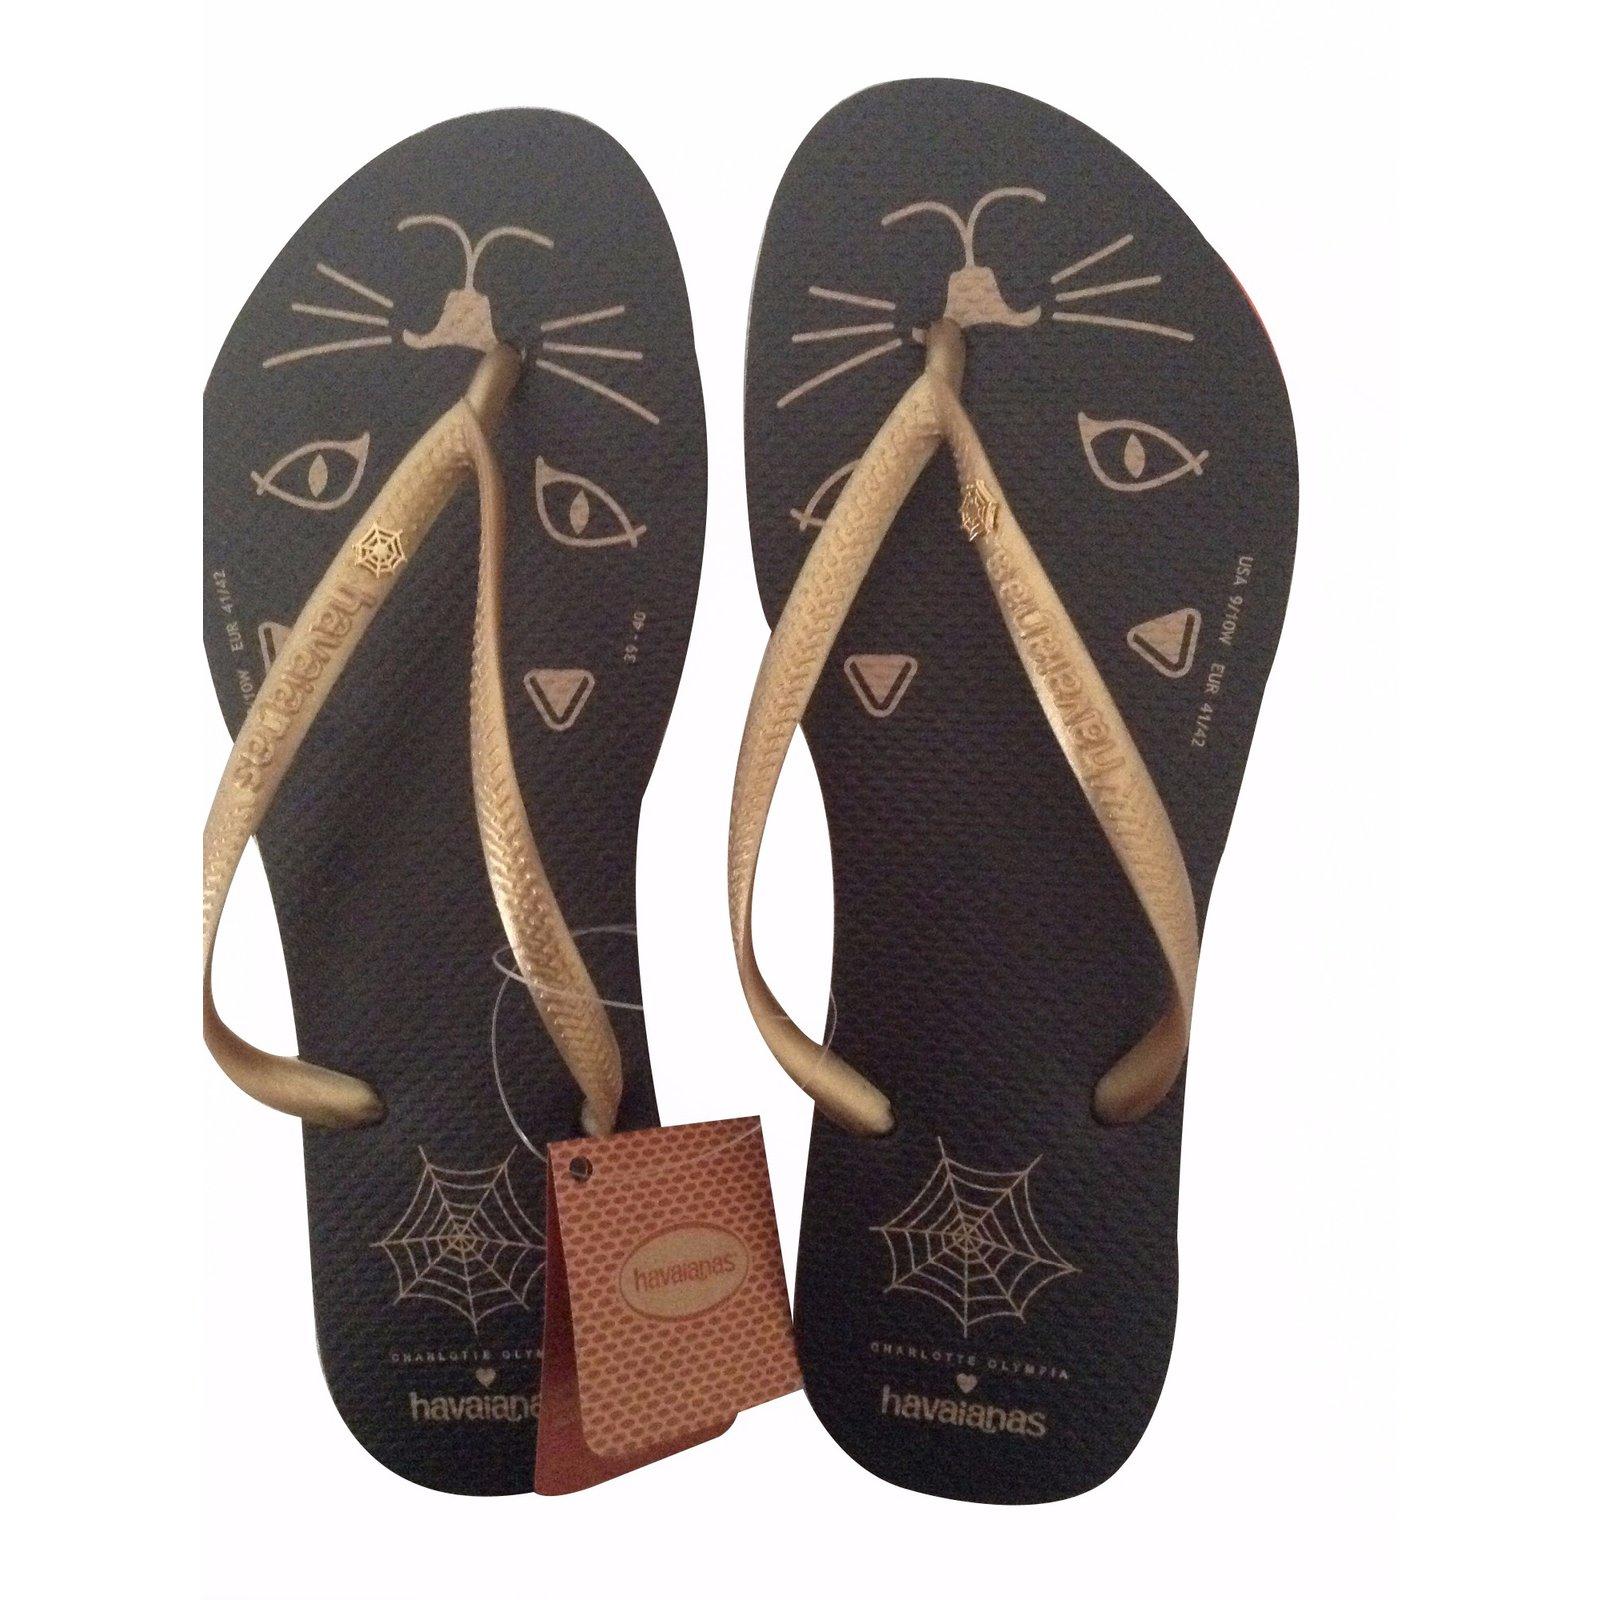 1e67fc74b76a Charlotte Olympia Sandals Sandals Rubber Black ref.20866 - Joli Closet